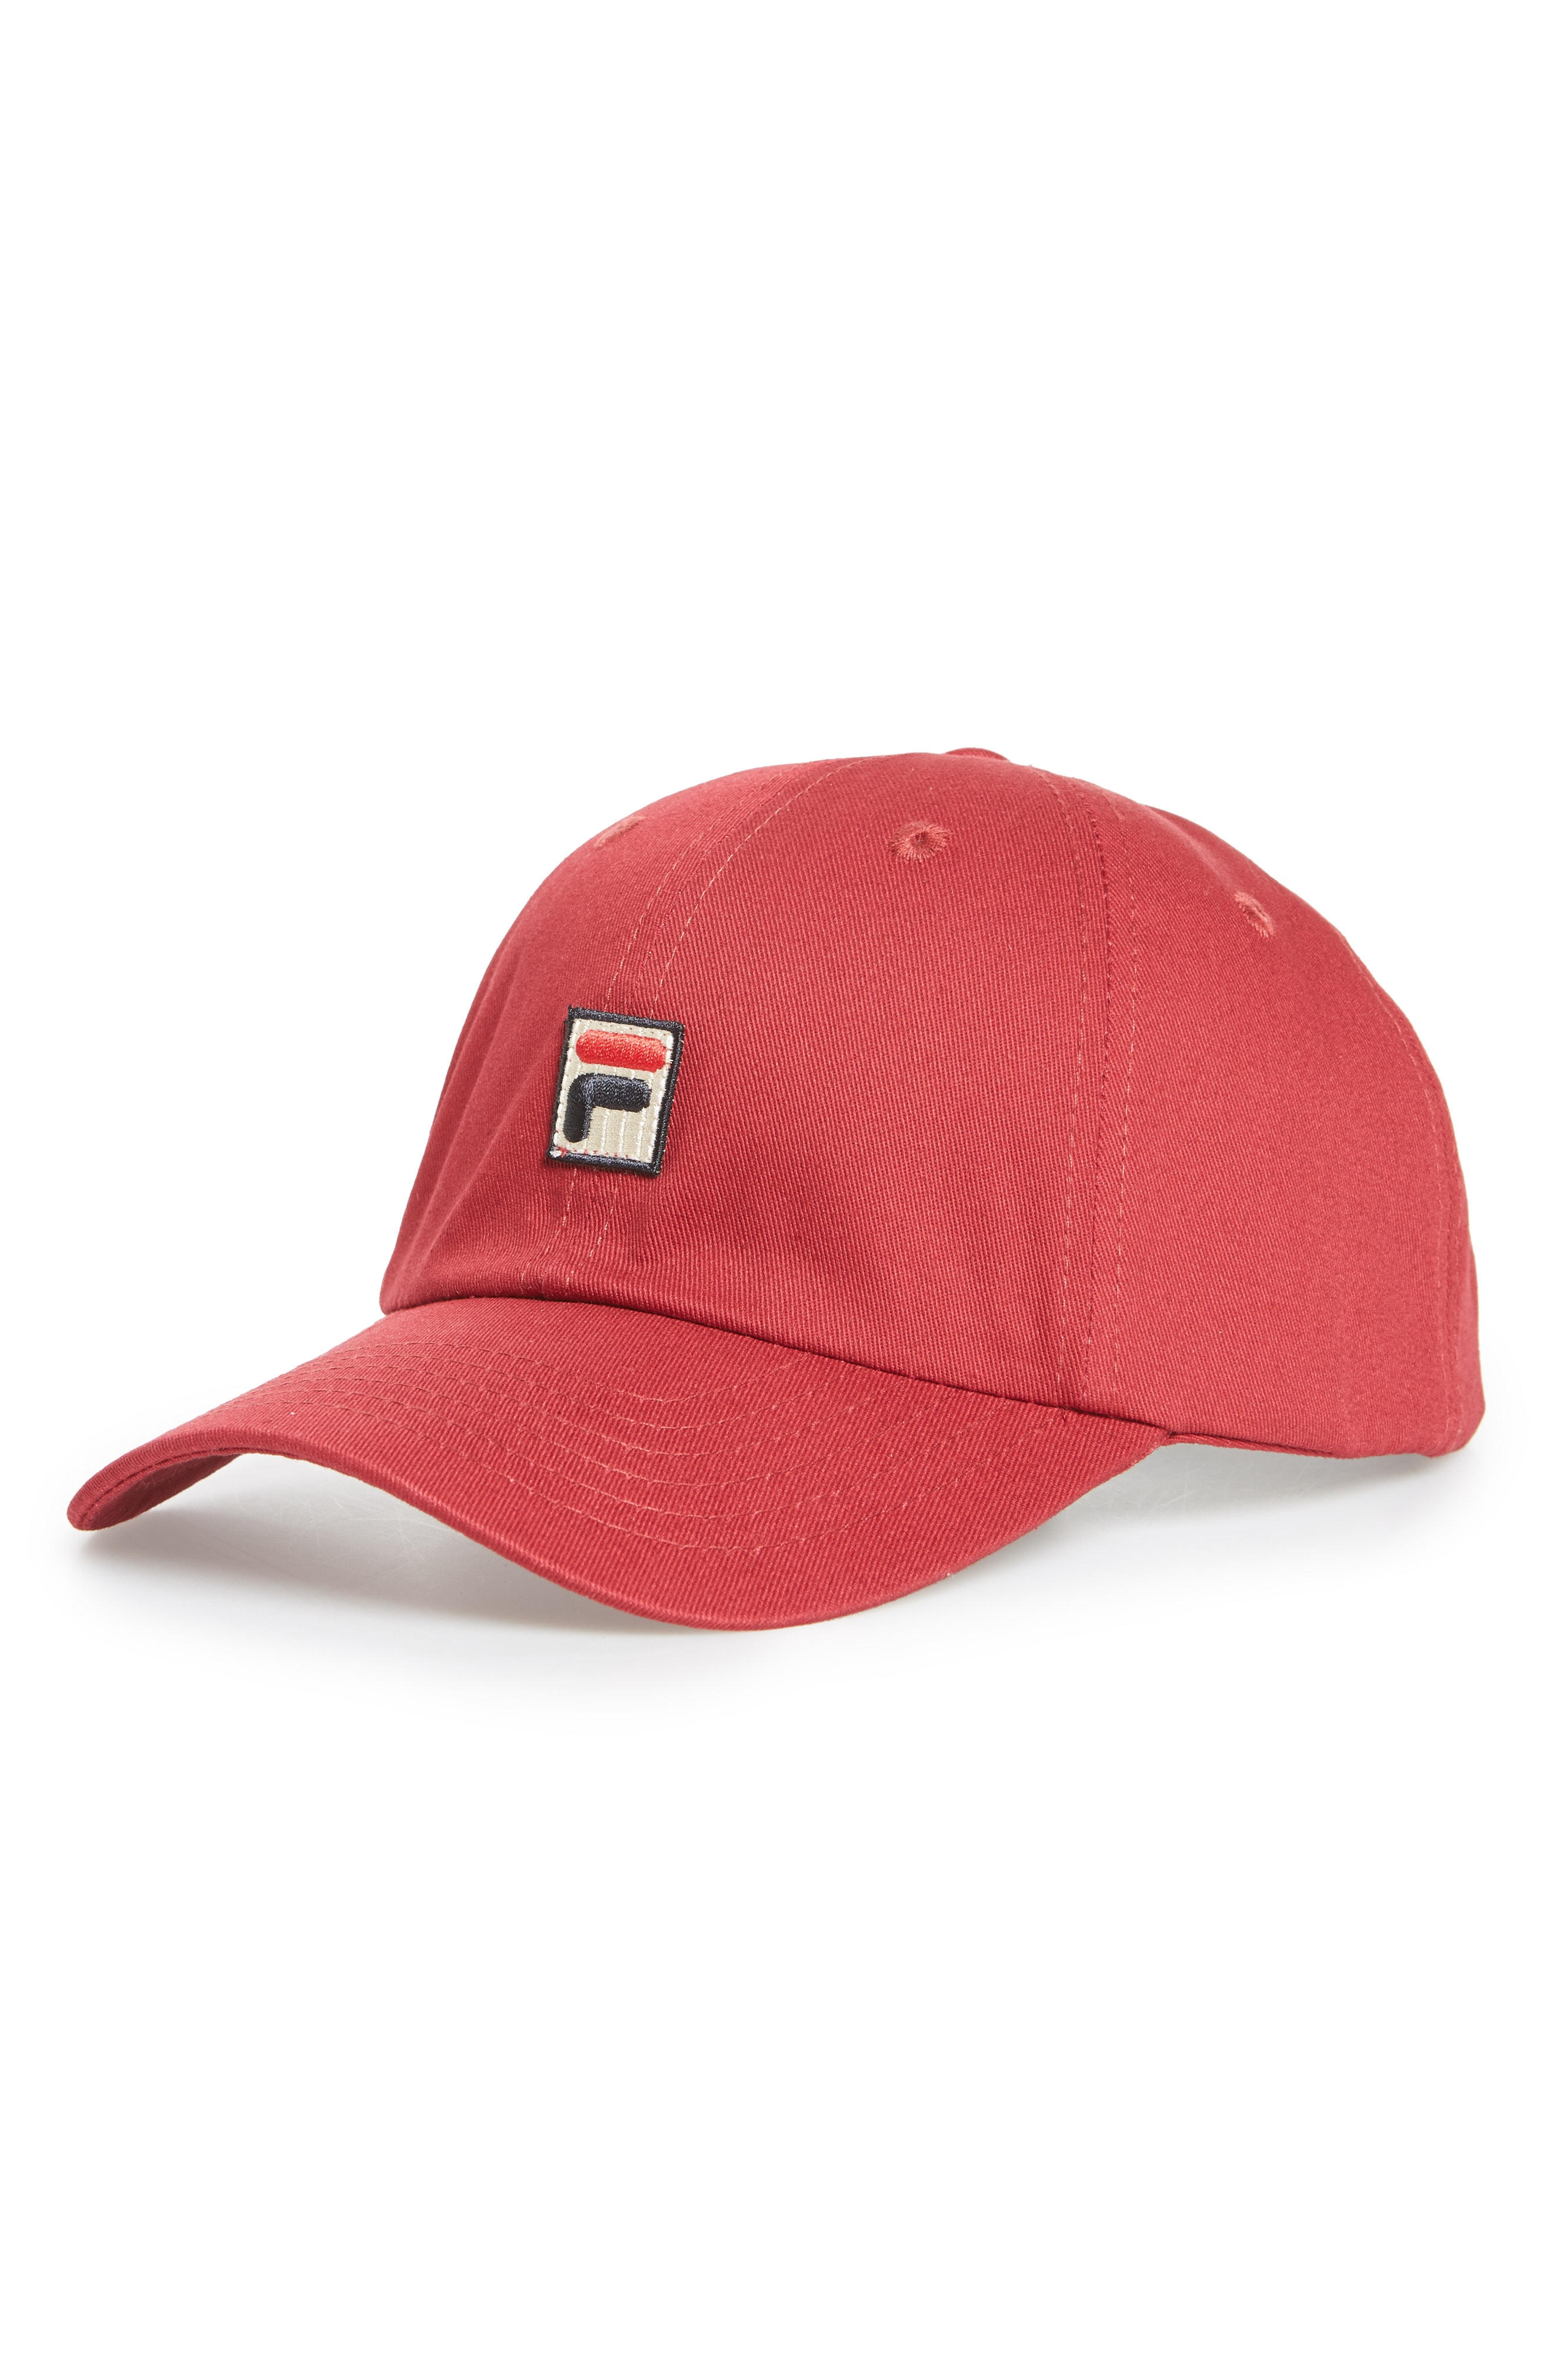 FILA Heritage Cotton Twill Cap